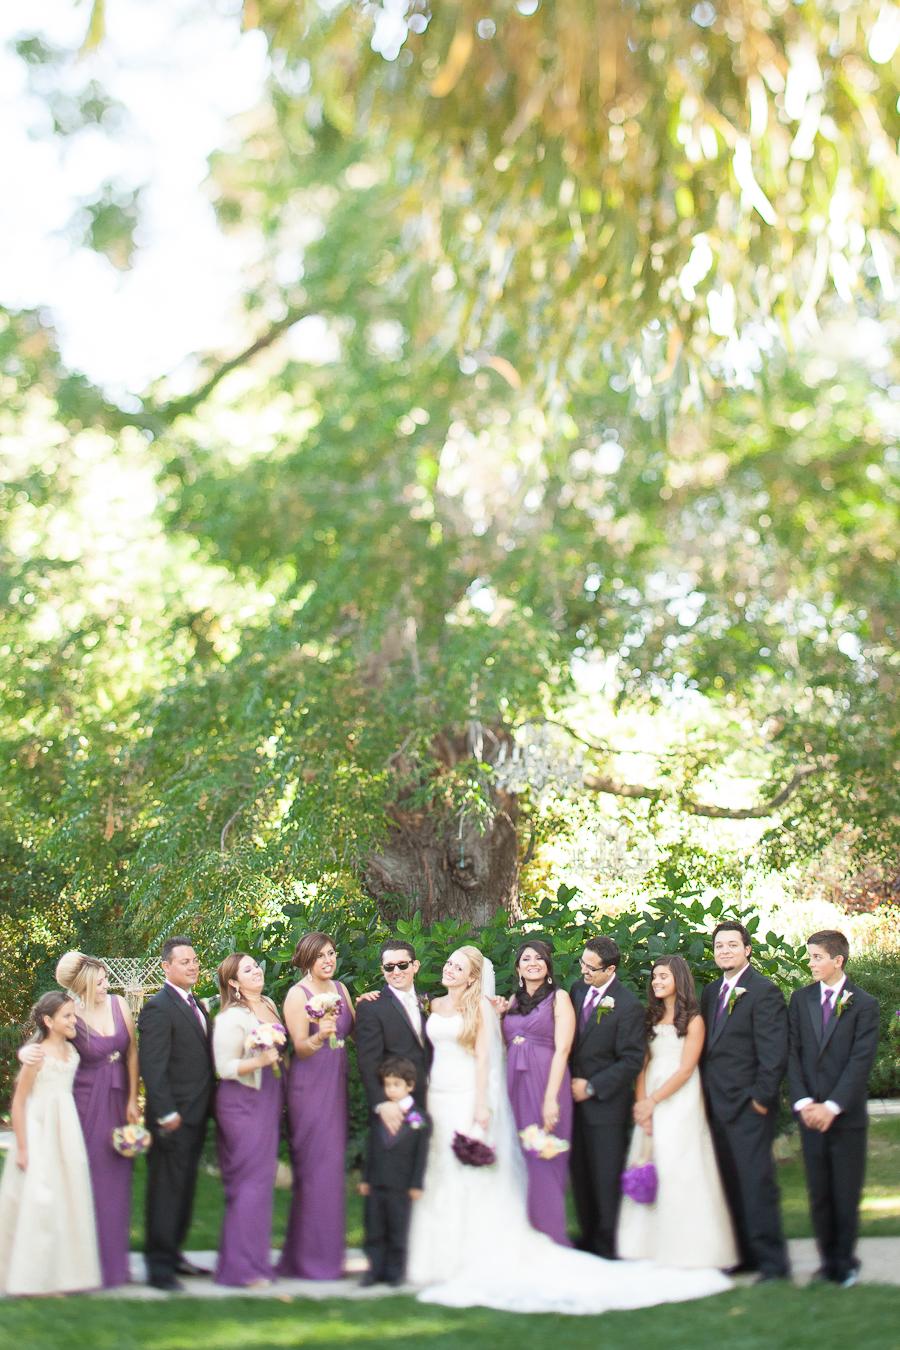 french wedding, elegant wedding, fine art wedding, fine art wedding photographer, california fine art wedding photographer, twin oaks house wedding, twin oaks house san marcos wedding